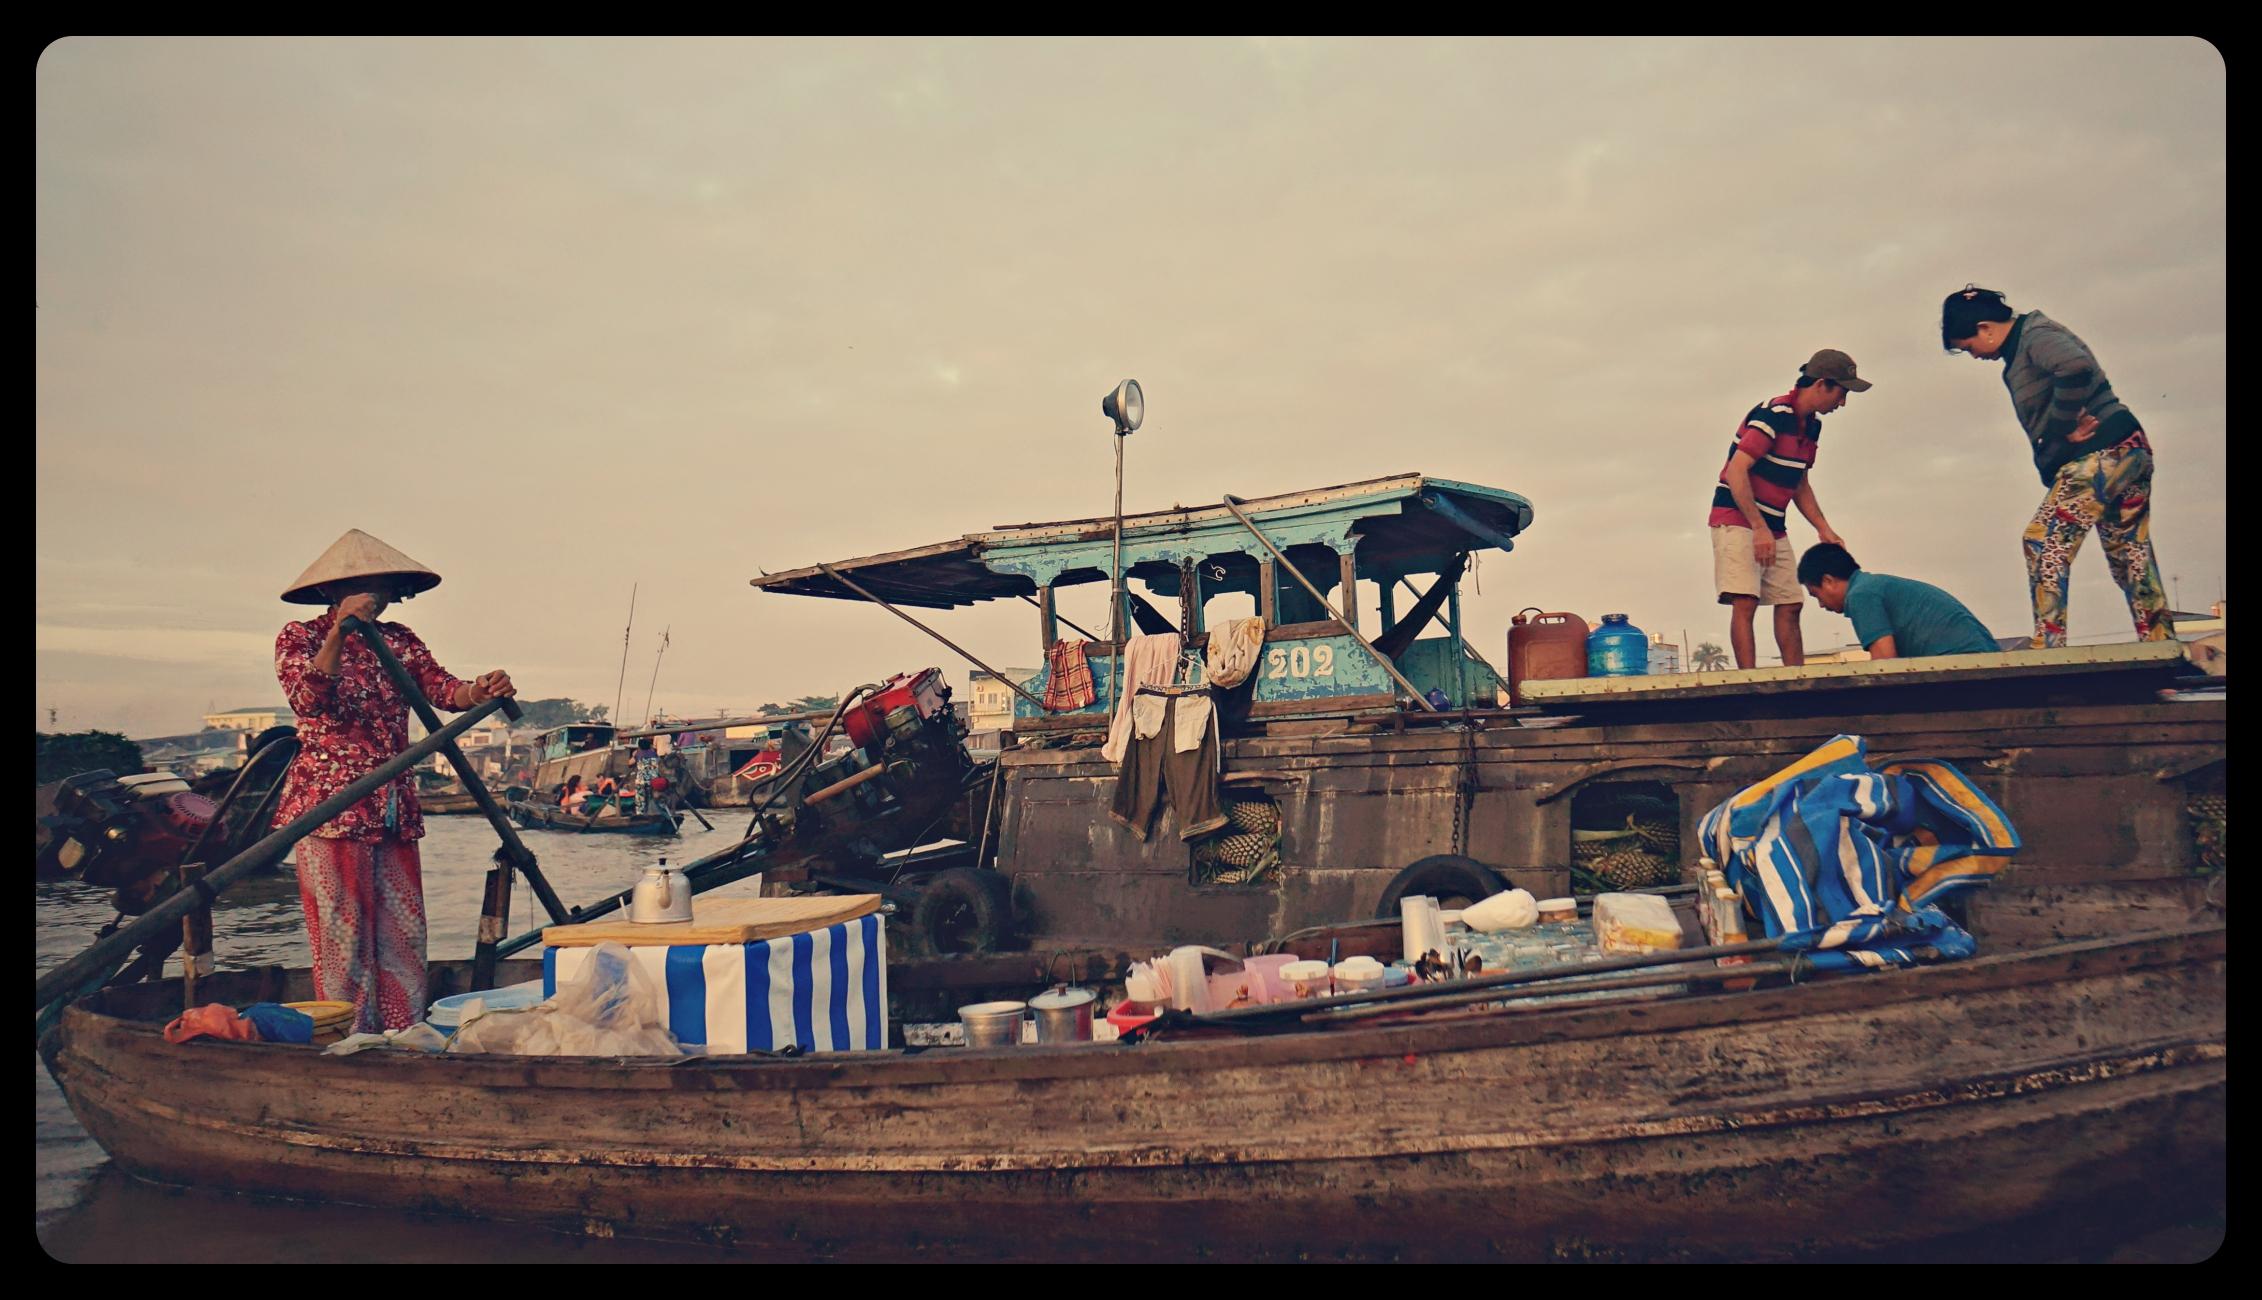 Pływający targ Cai Rang